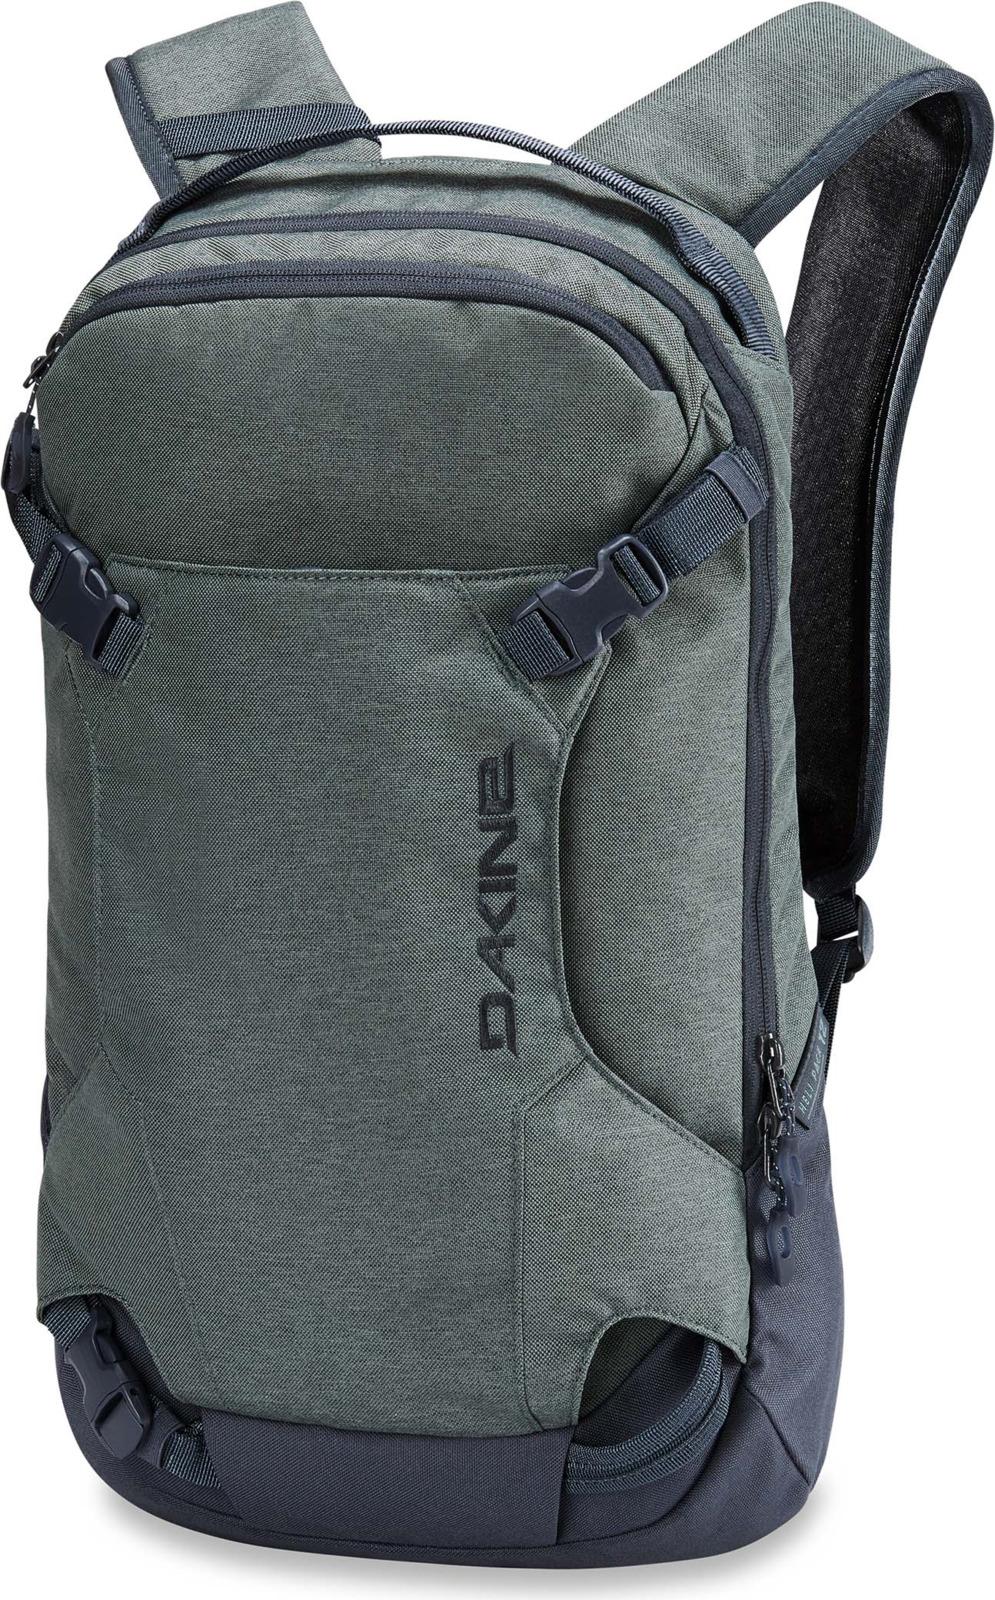 Рюкзак Dakine Heli Pack, цвет: серо-зеленый, 12 л oiwas ноутбук рюкзак мода случайные